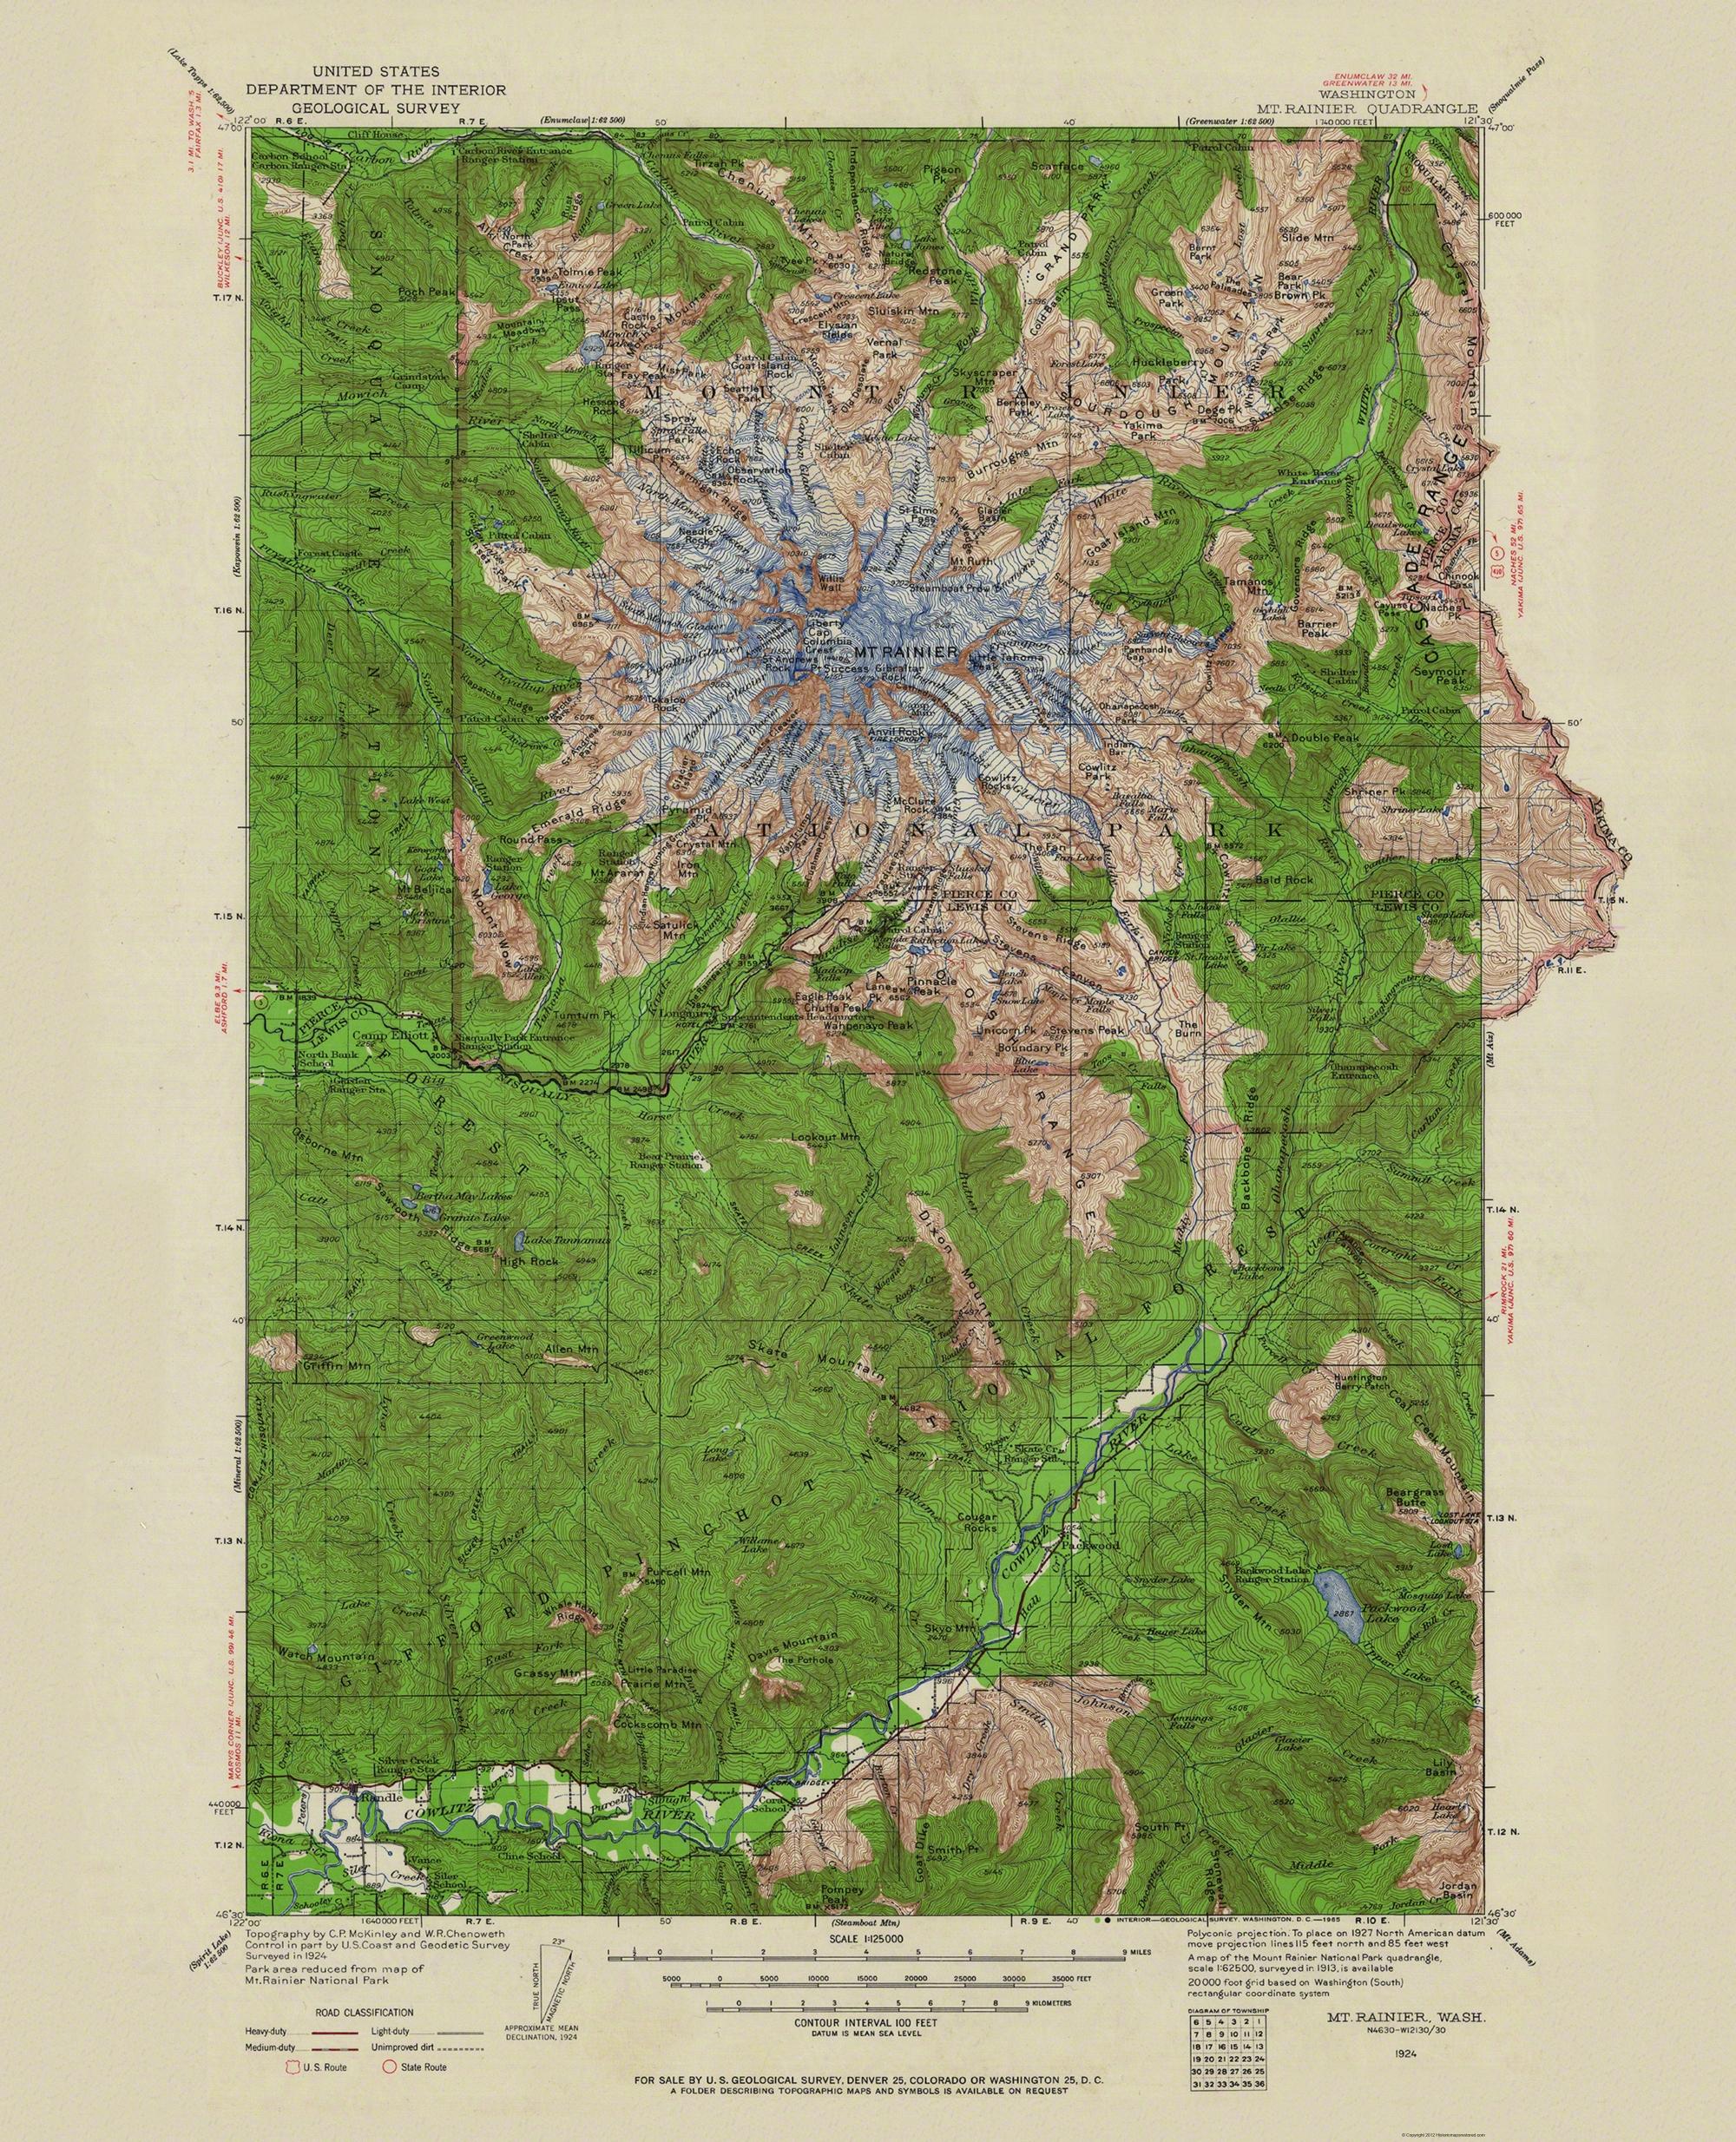 Mt Rainier Topographic Map.Old Topographical Map Mt Rainier Washington 1924